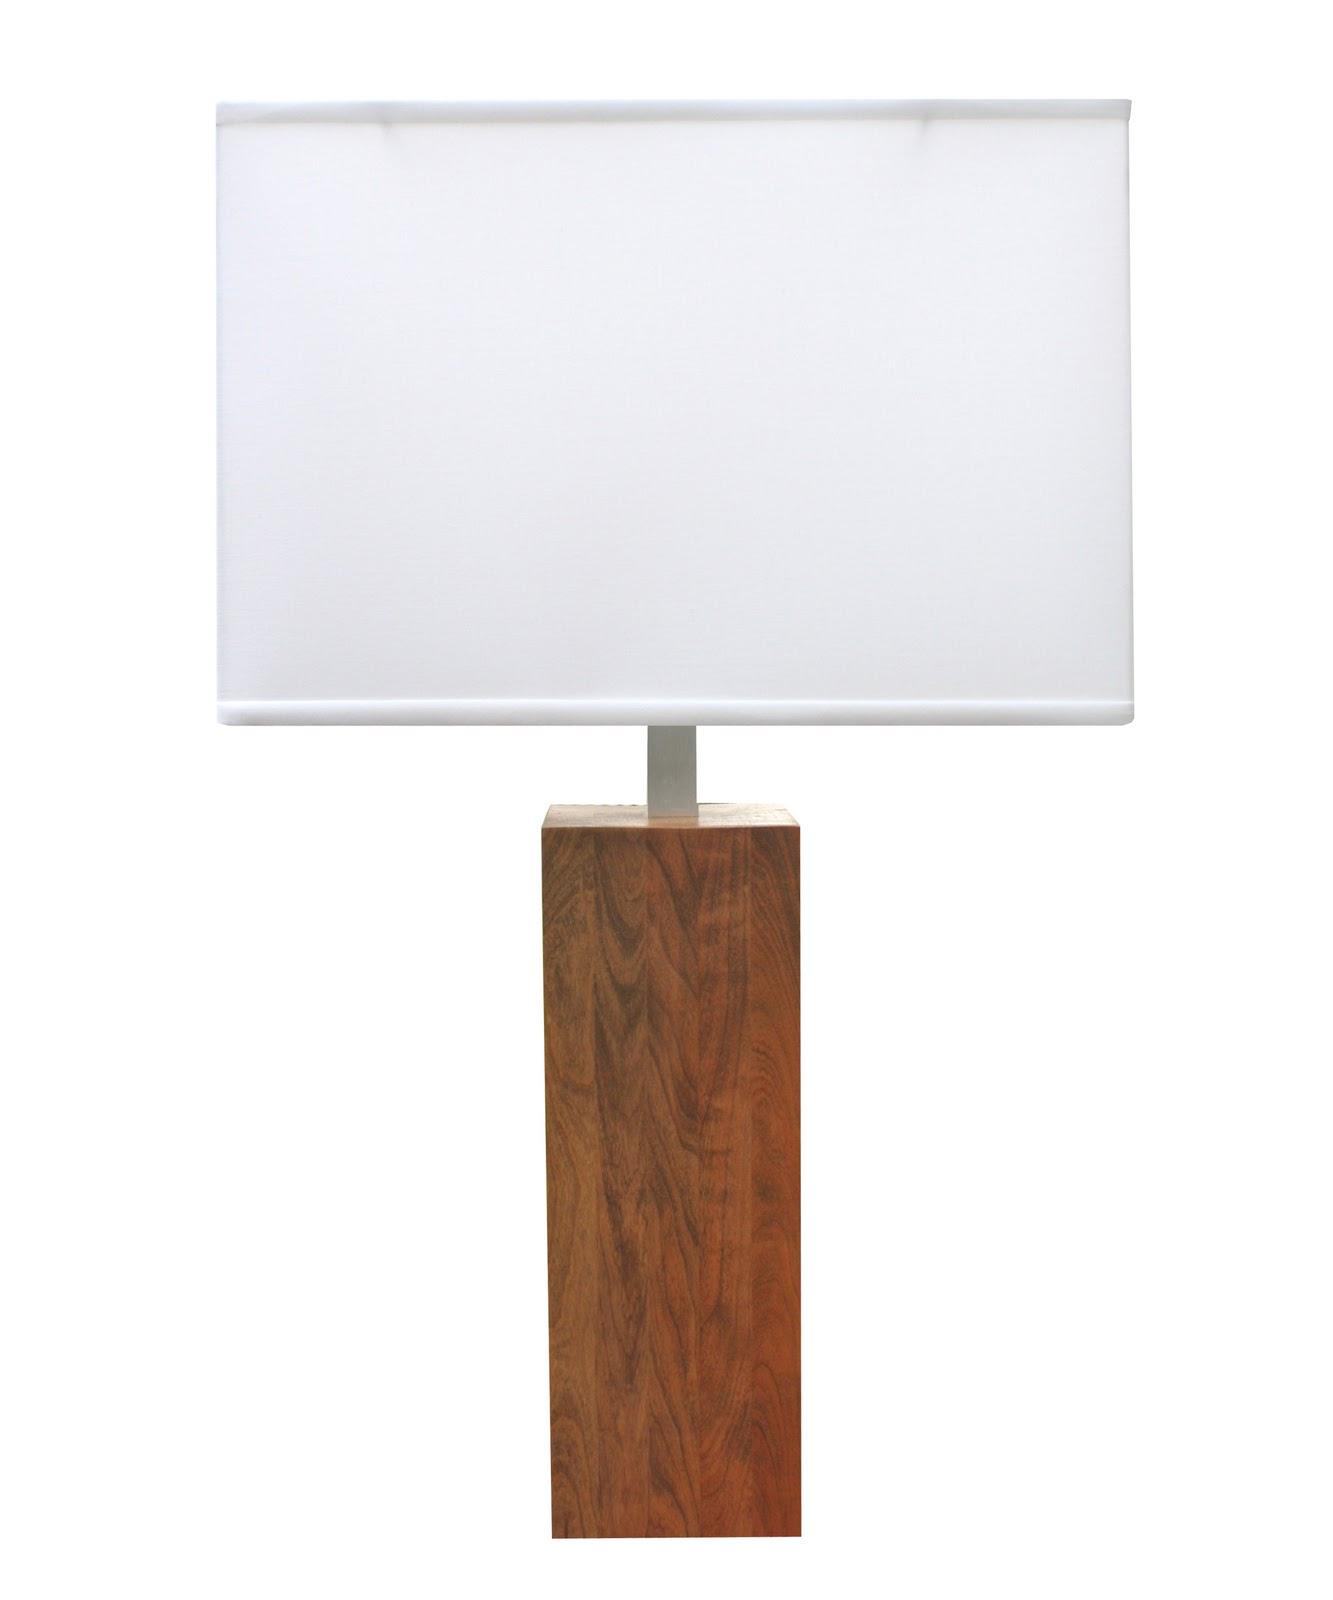 High Street Market: Winston Wood Table Lamp